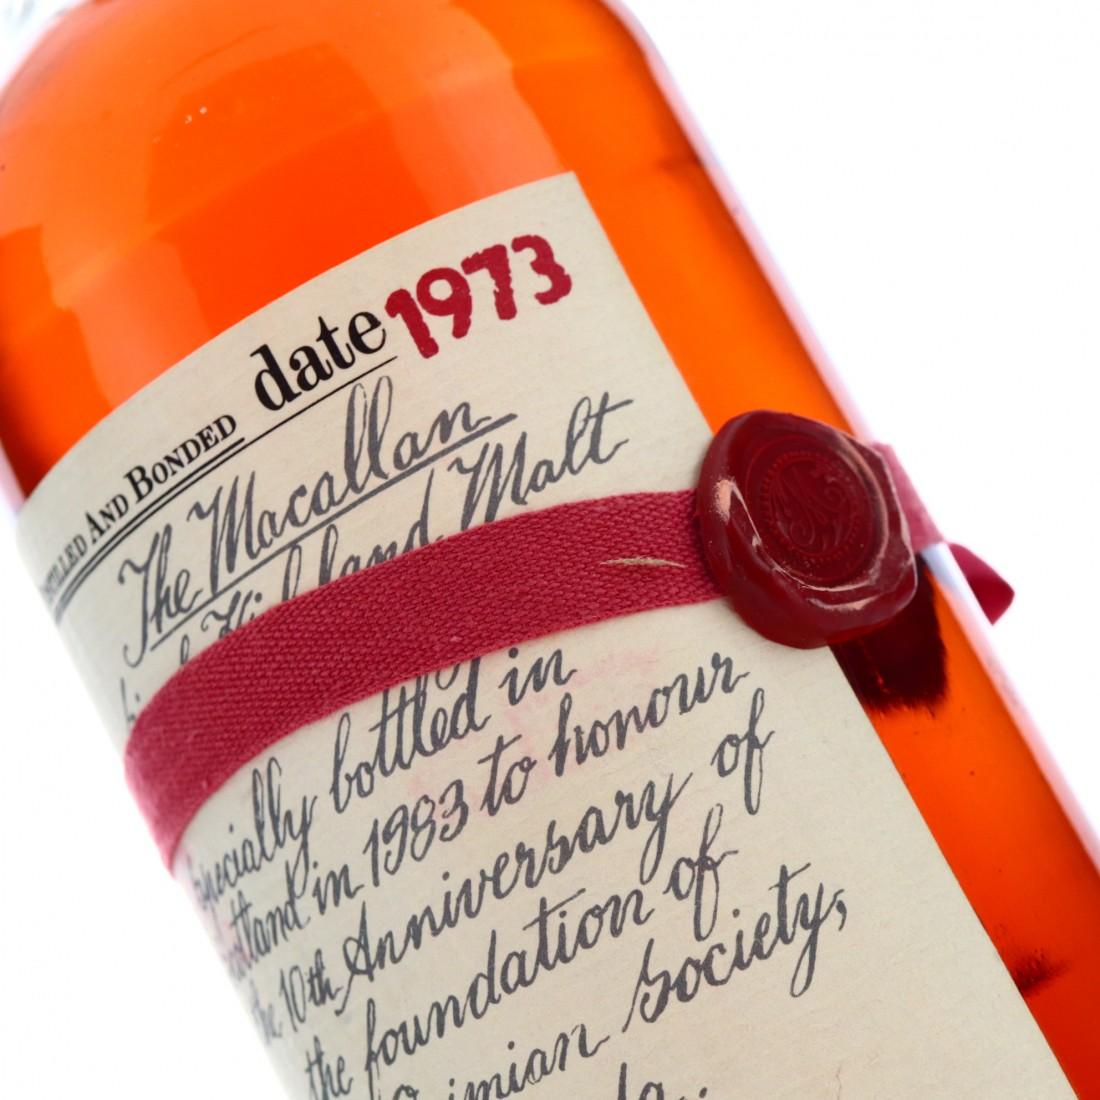 Macallan 1973 Handwritten Label / Opimian Society 10th Anniversary